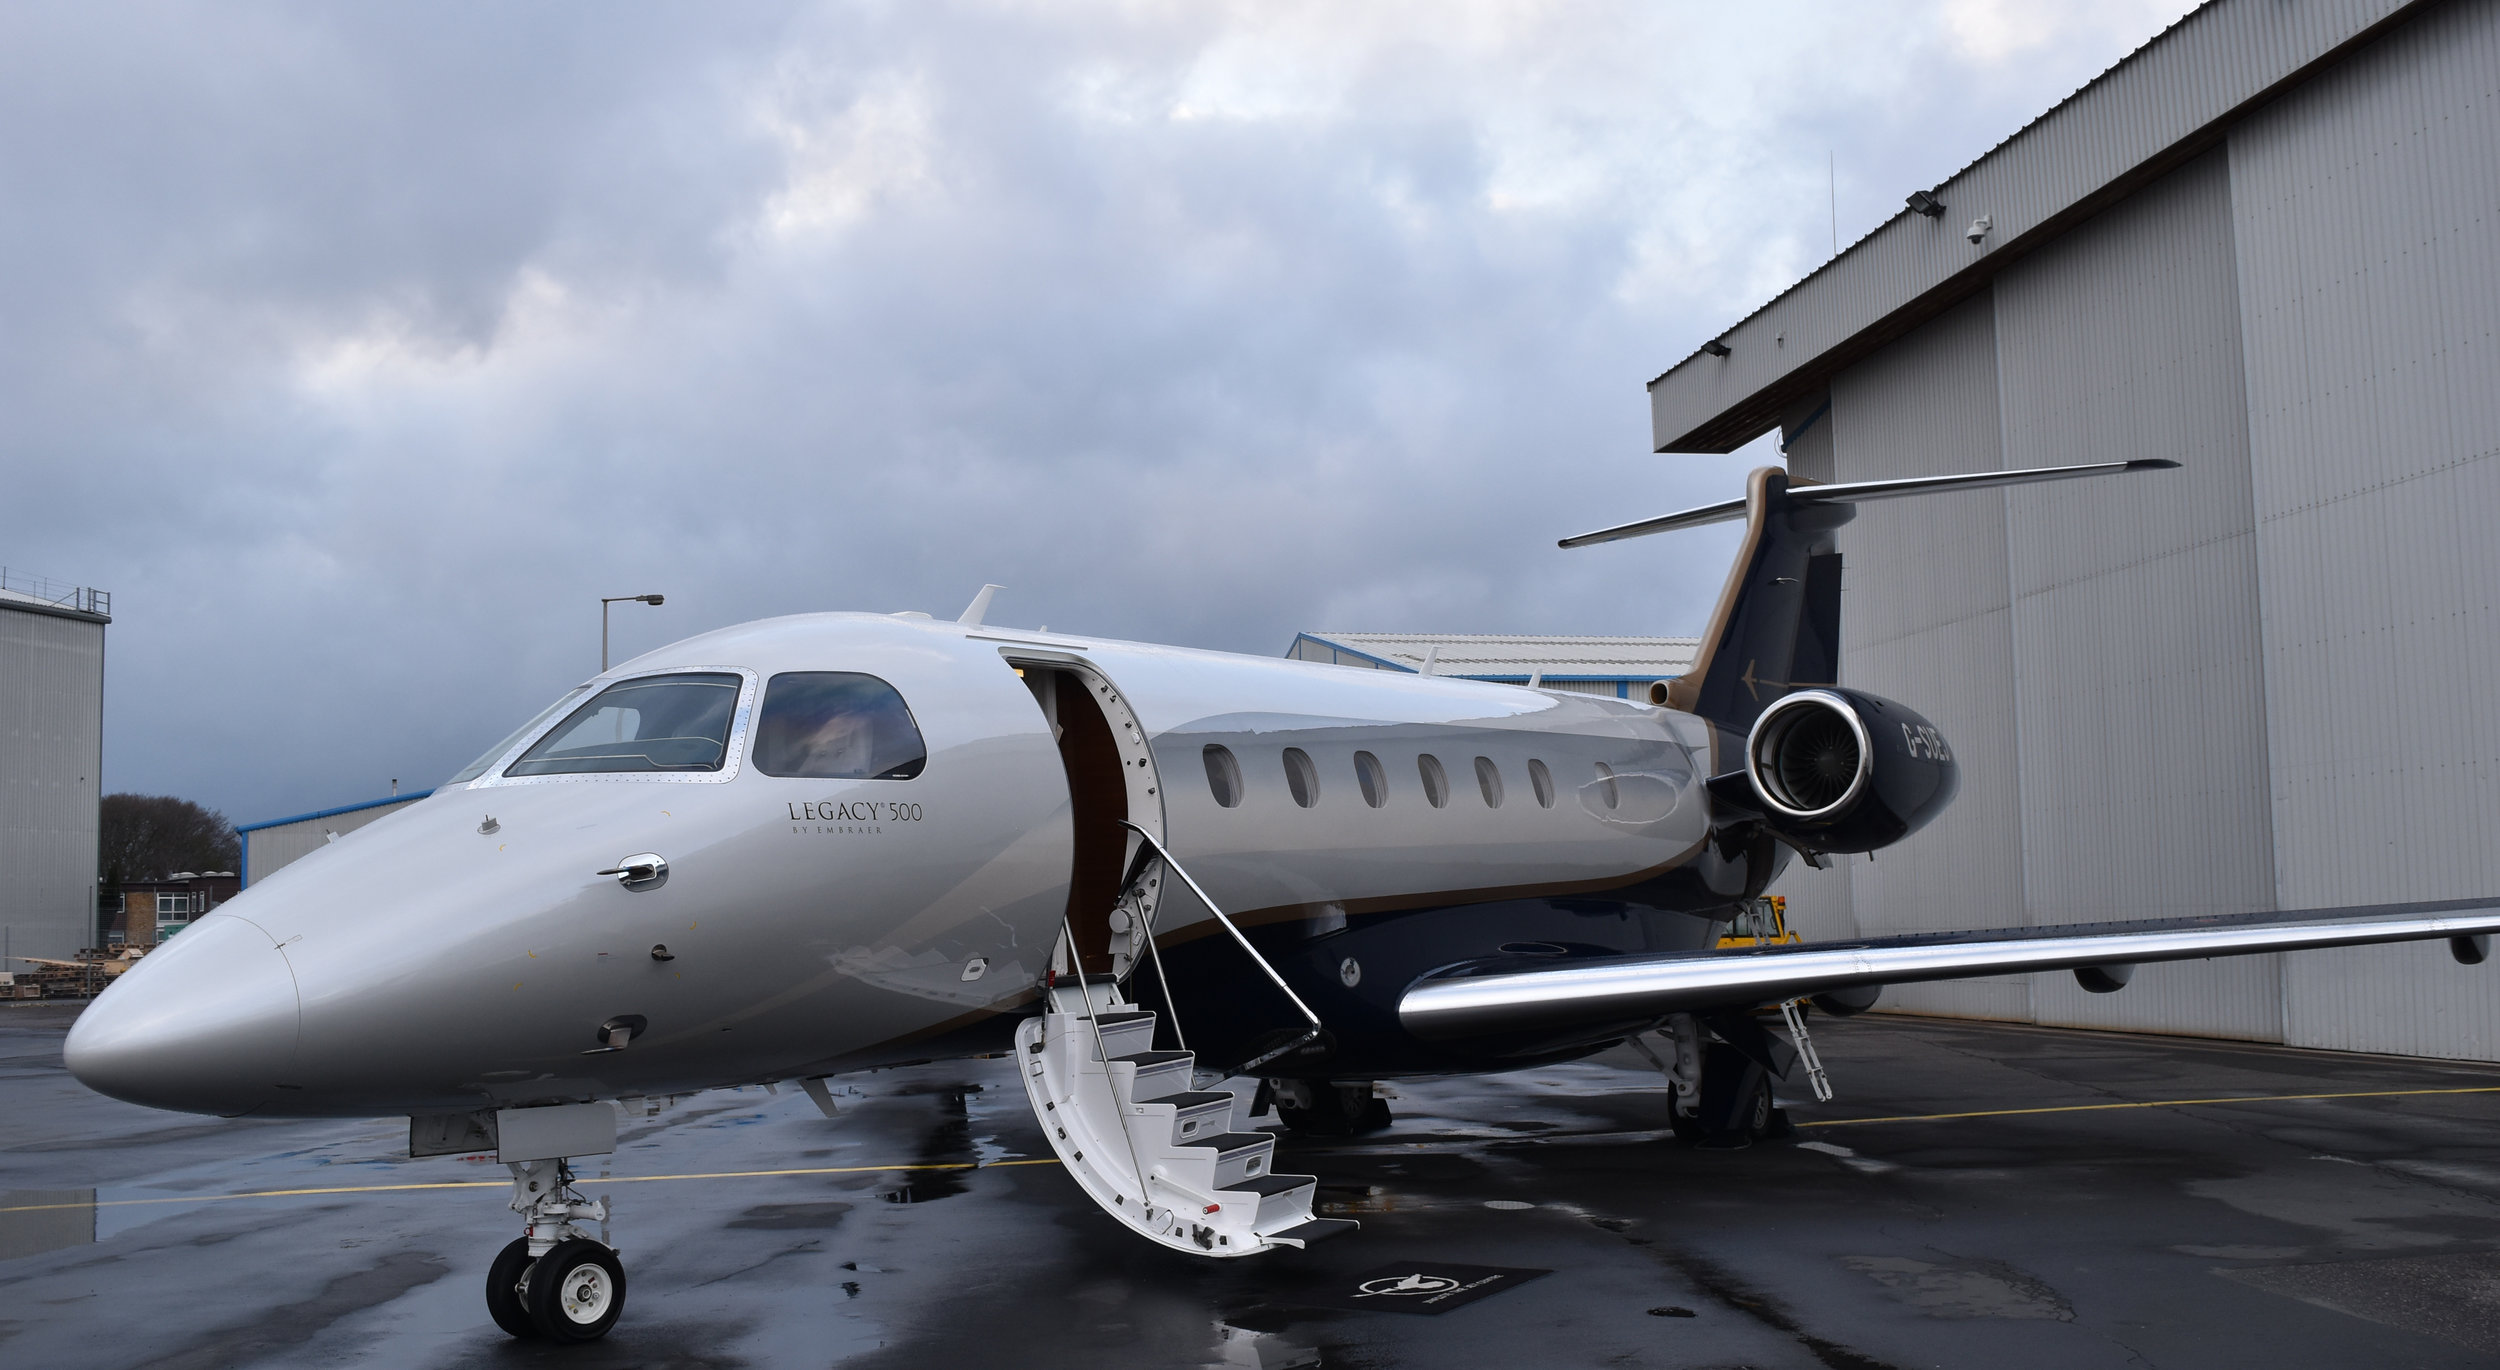 Embraer Legacy 500 1.jpg